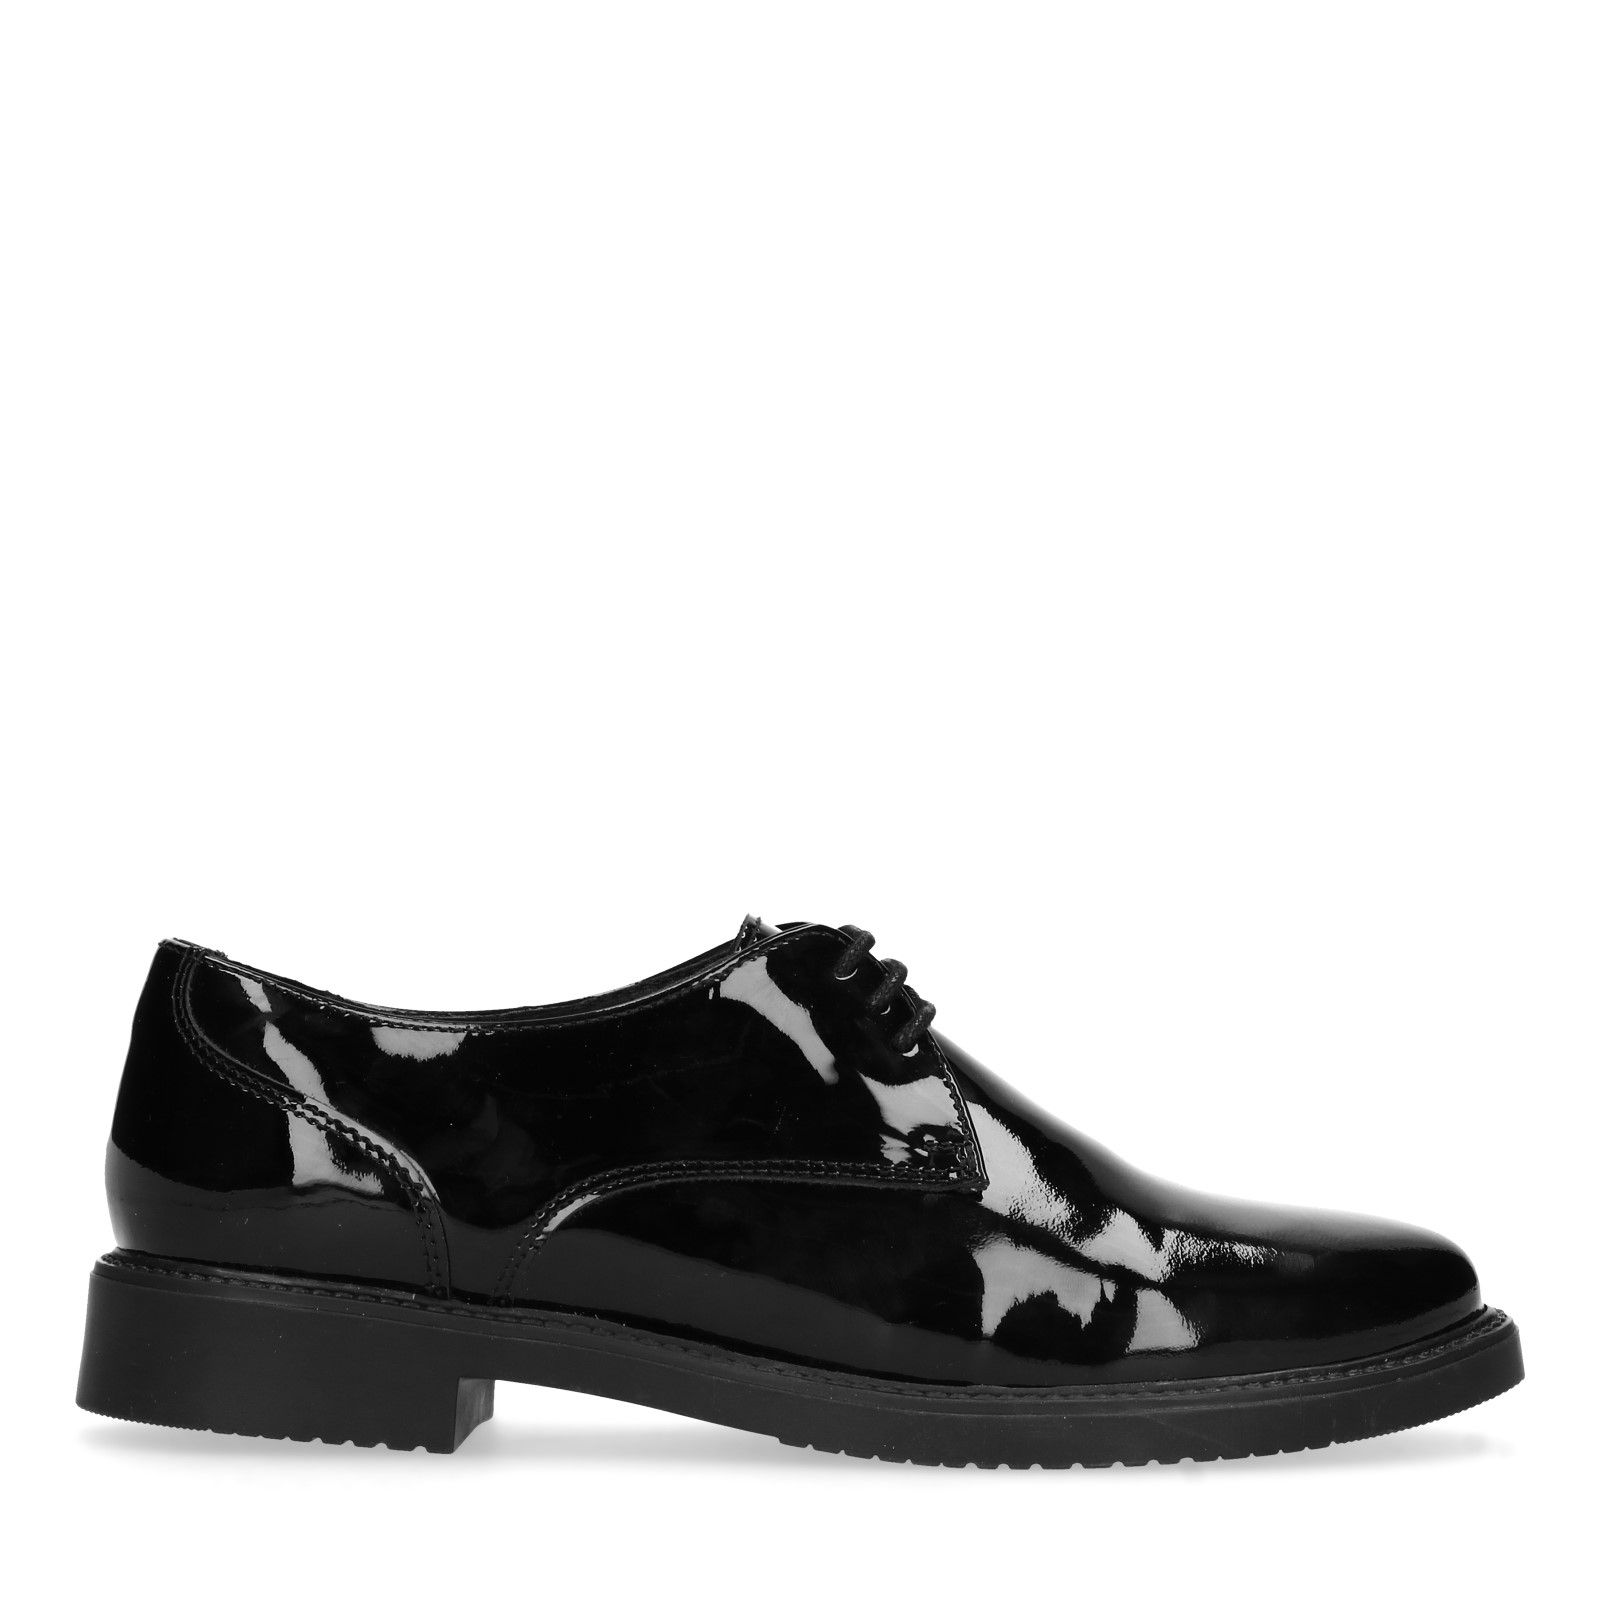 zwarte lak damesschoenen